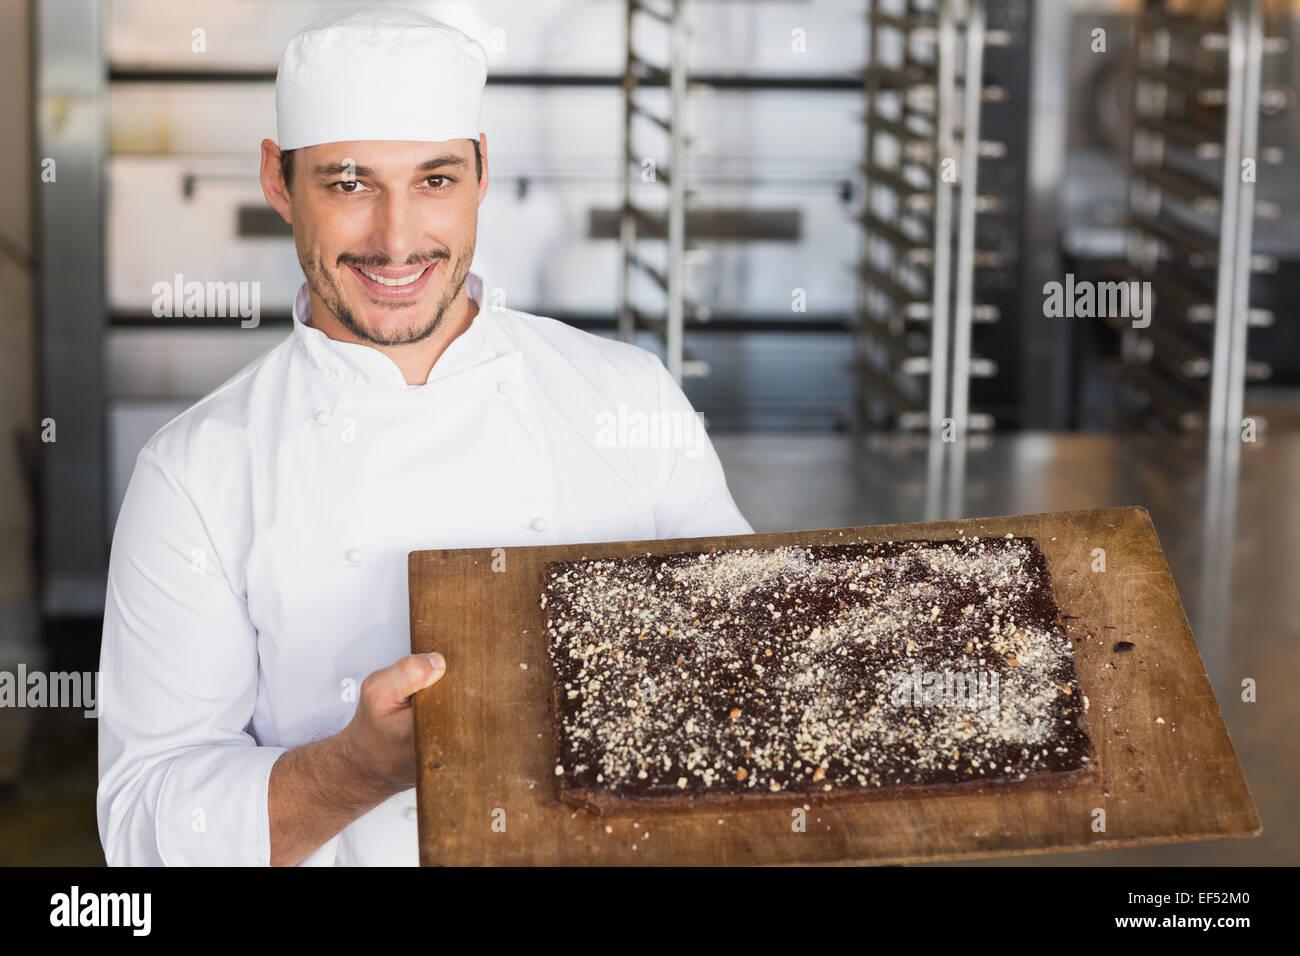 Baker showing freshly baked brownie - Stock Image